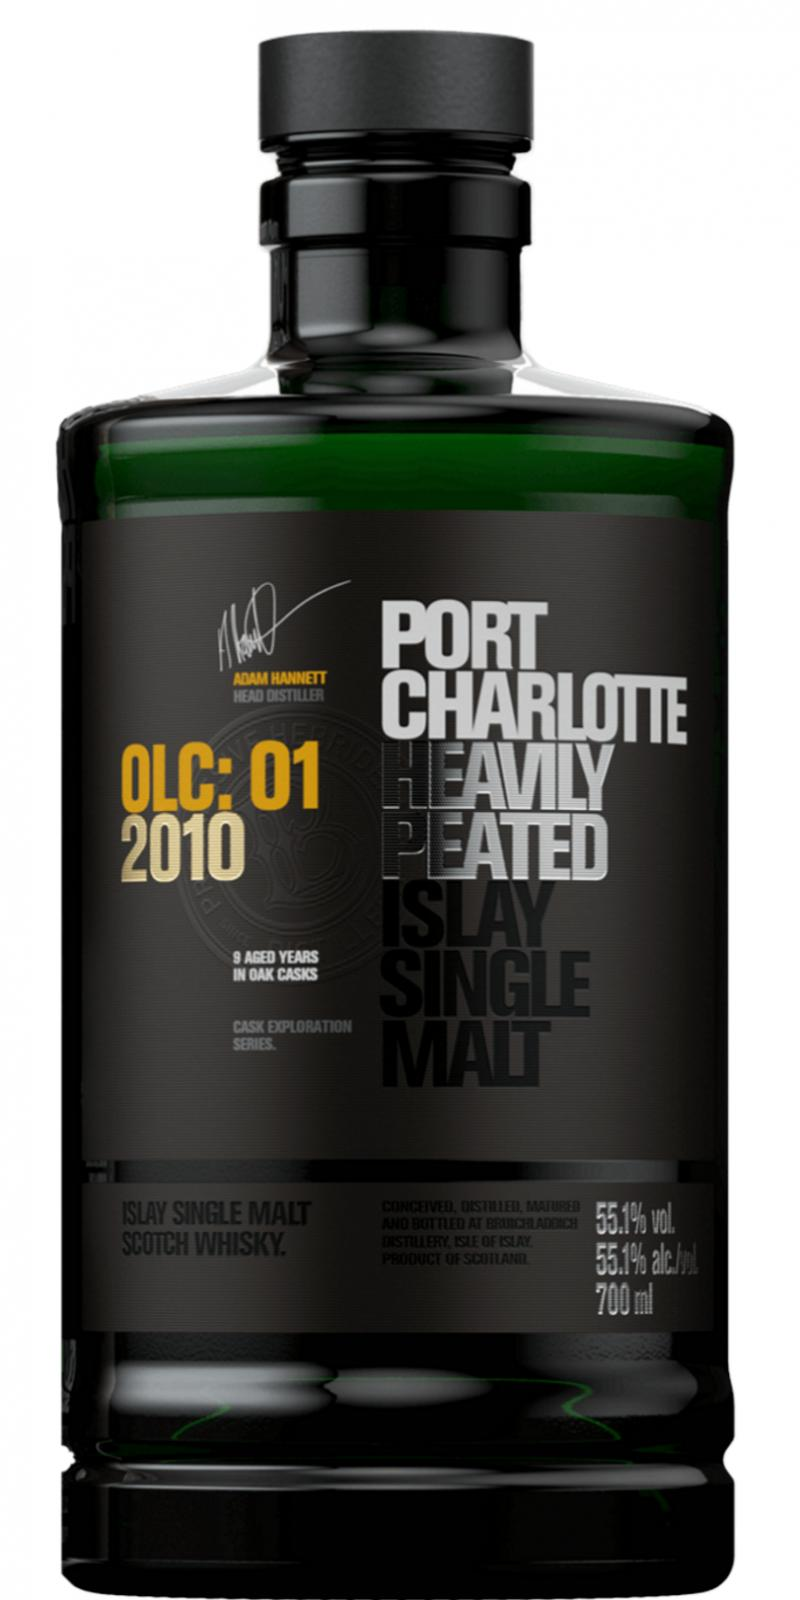 Port Charlotte 2010 - OLC: 01